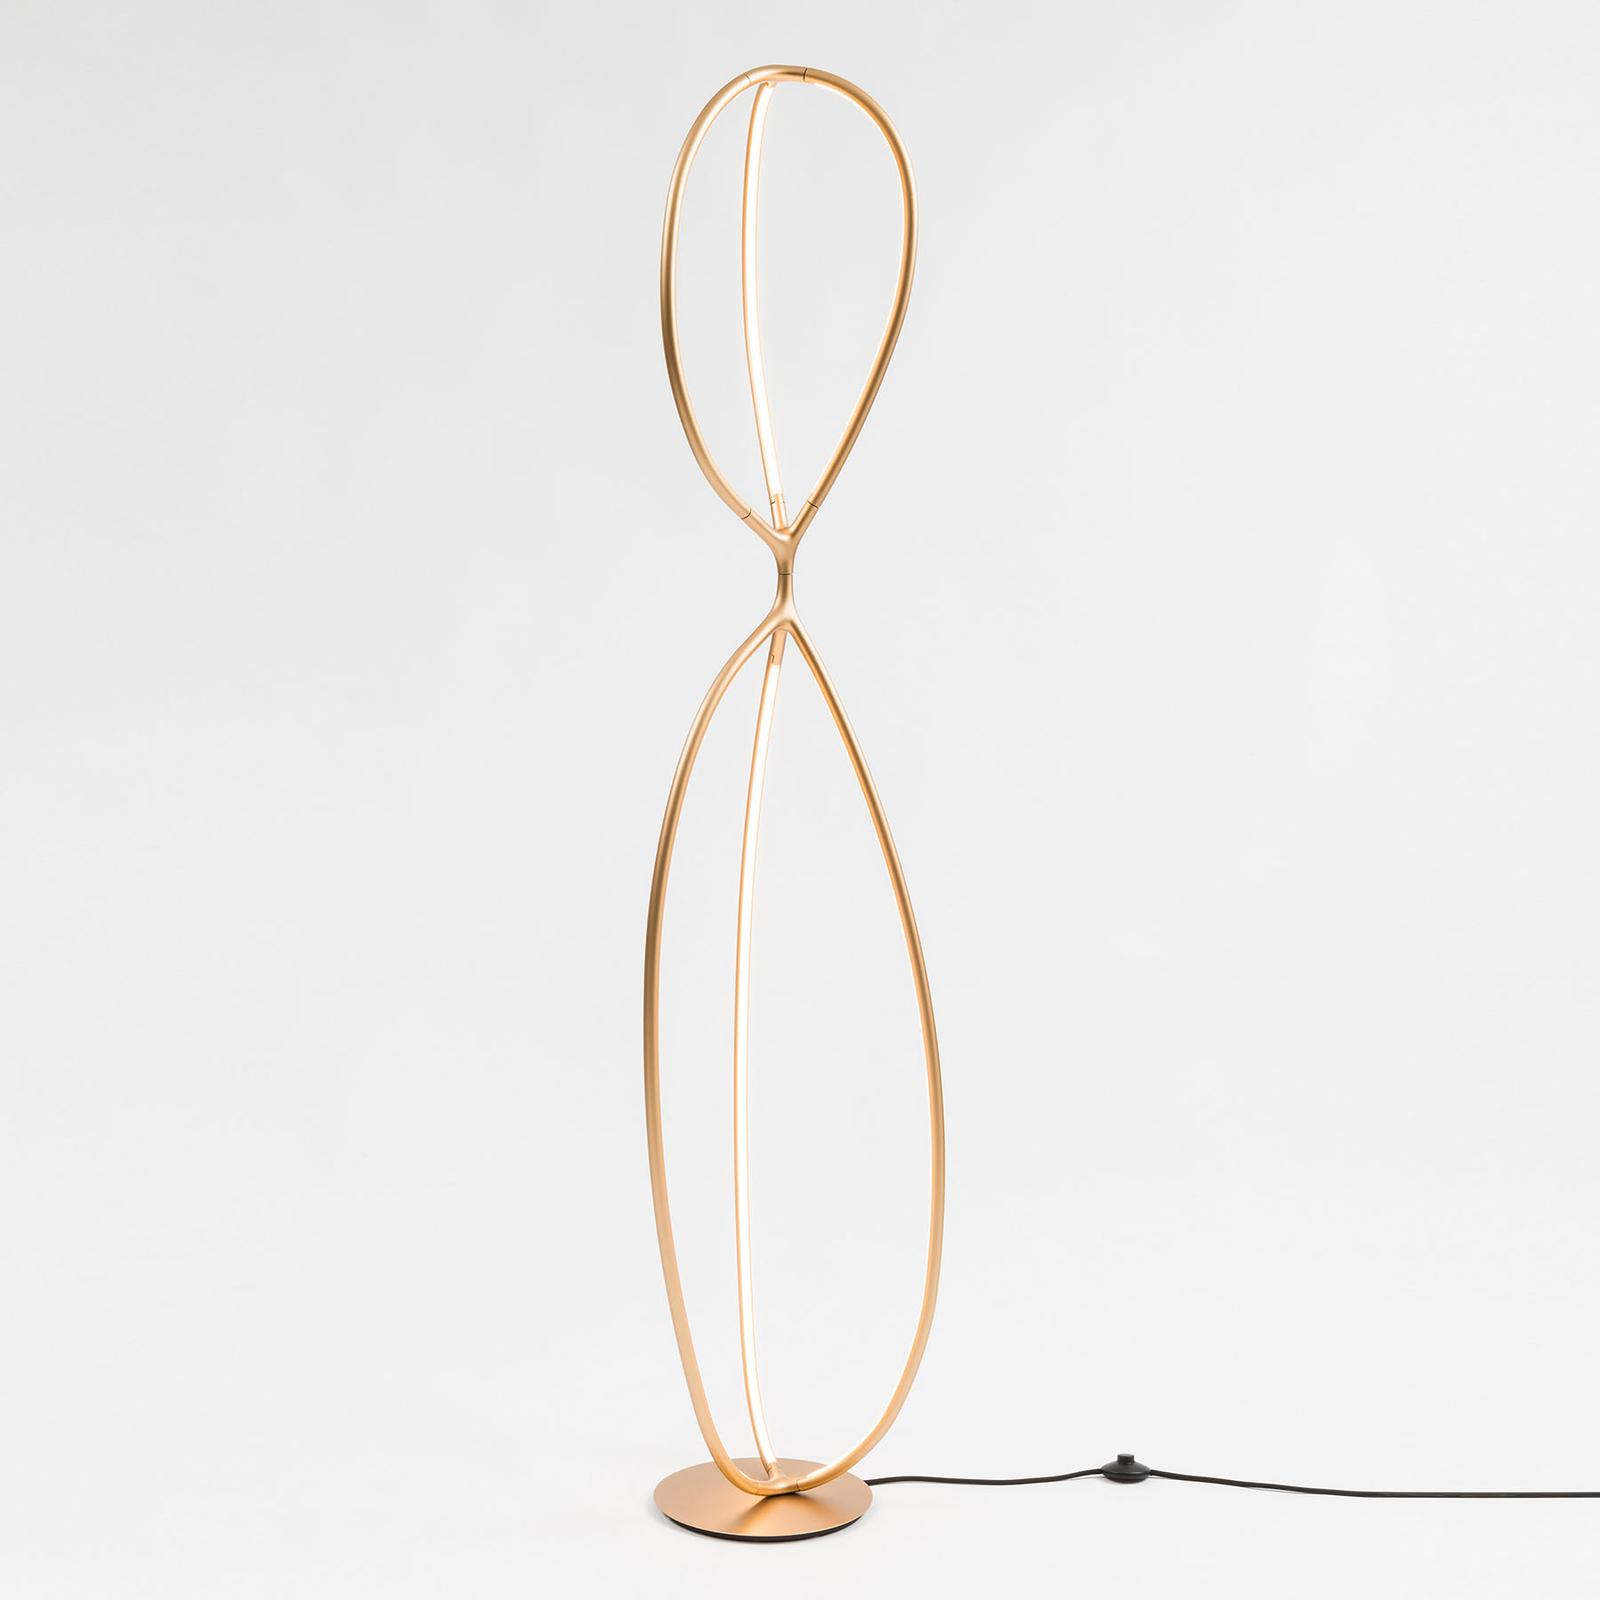 Artemide Arrival LED-Stehleuchte, messing